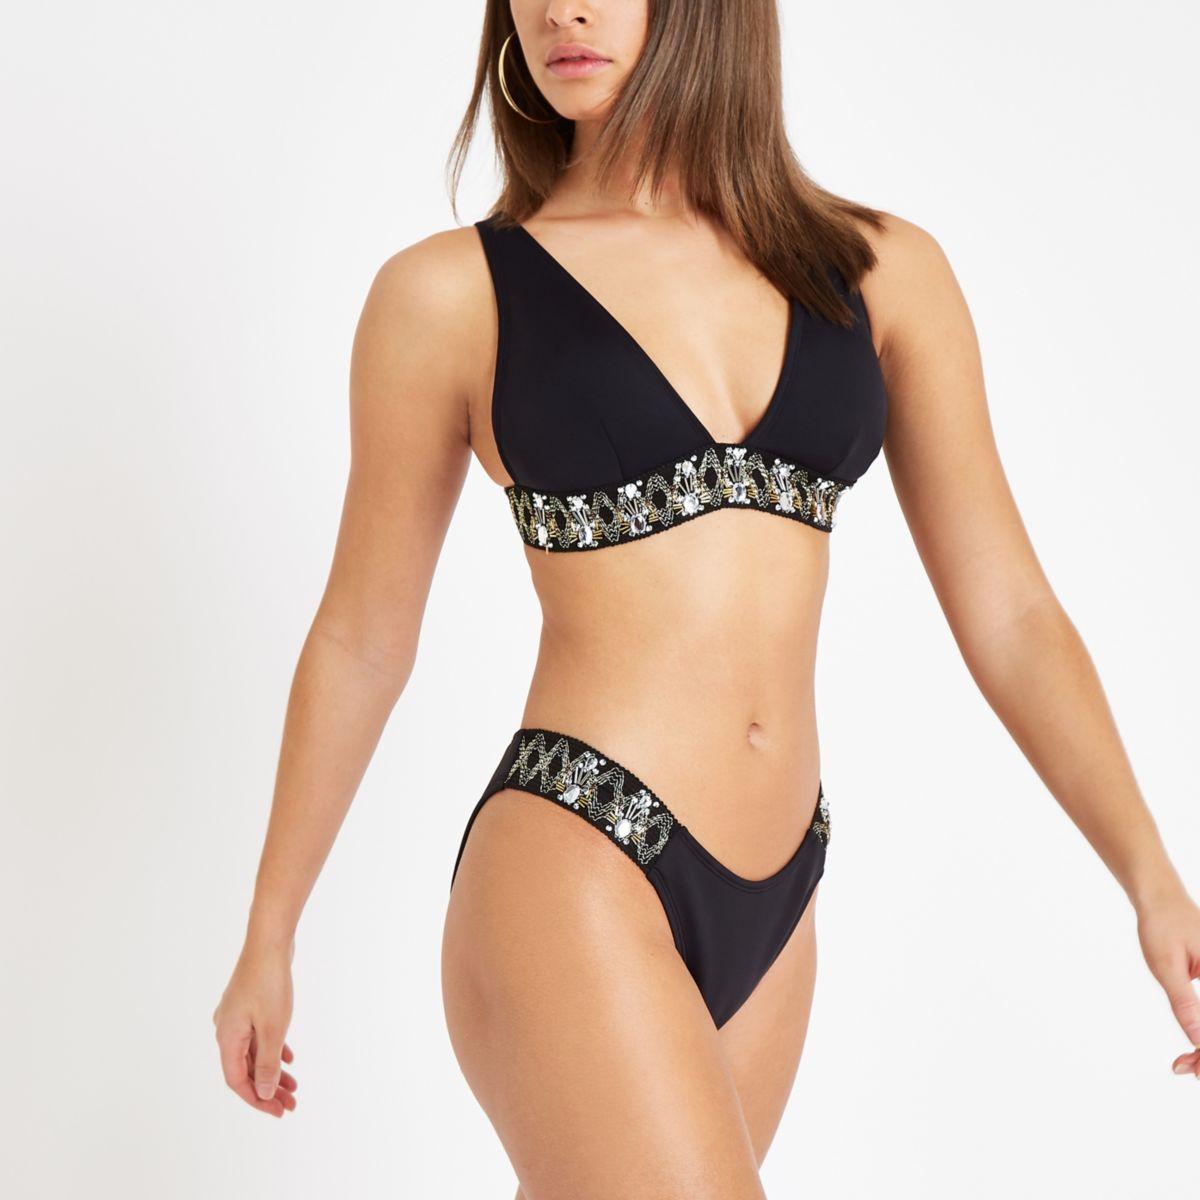 Bas de bikini échancré noir orné